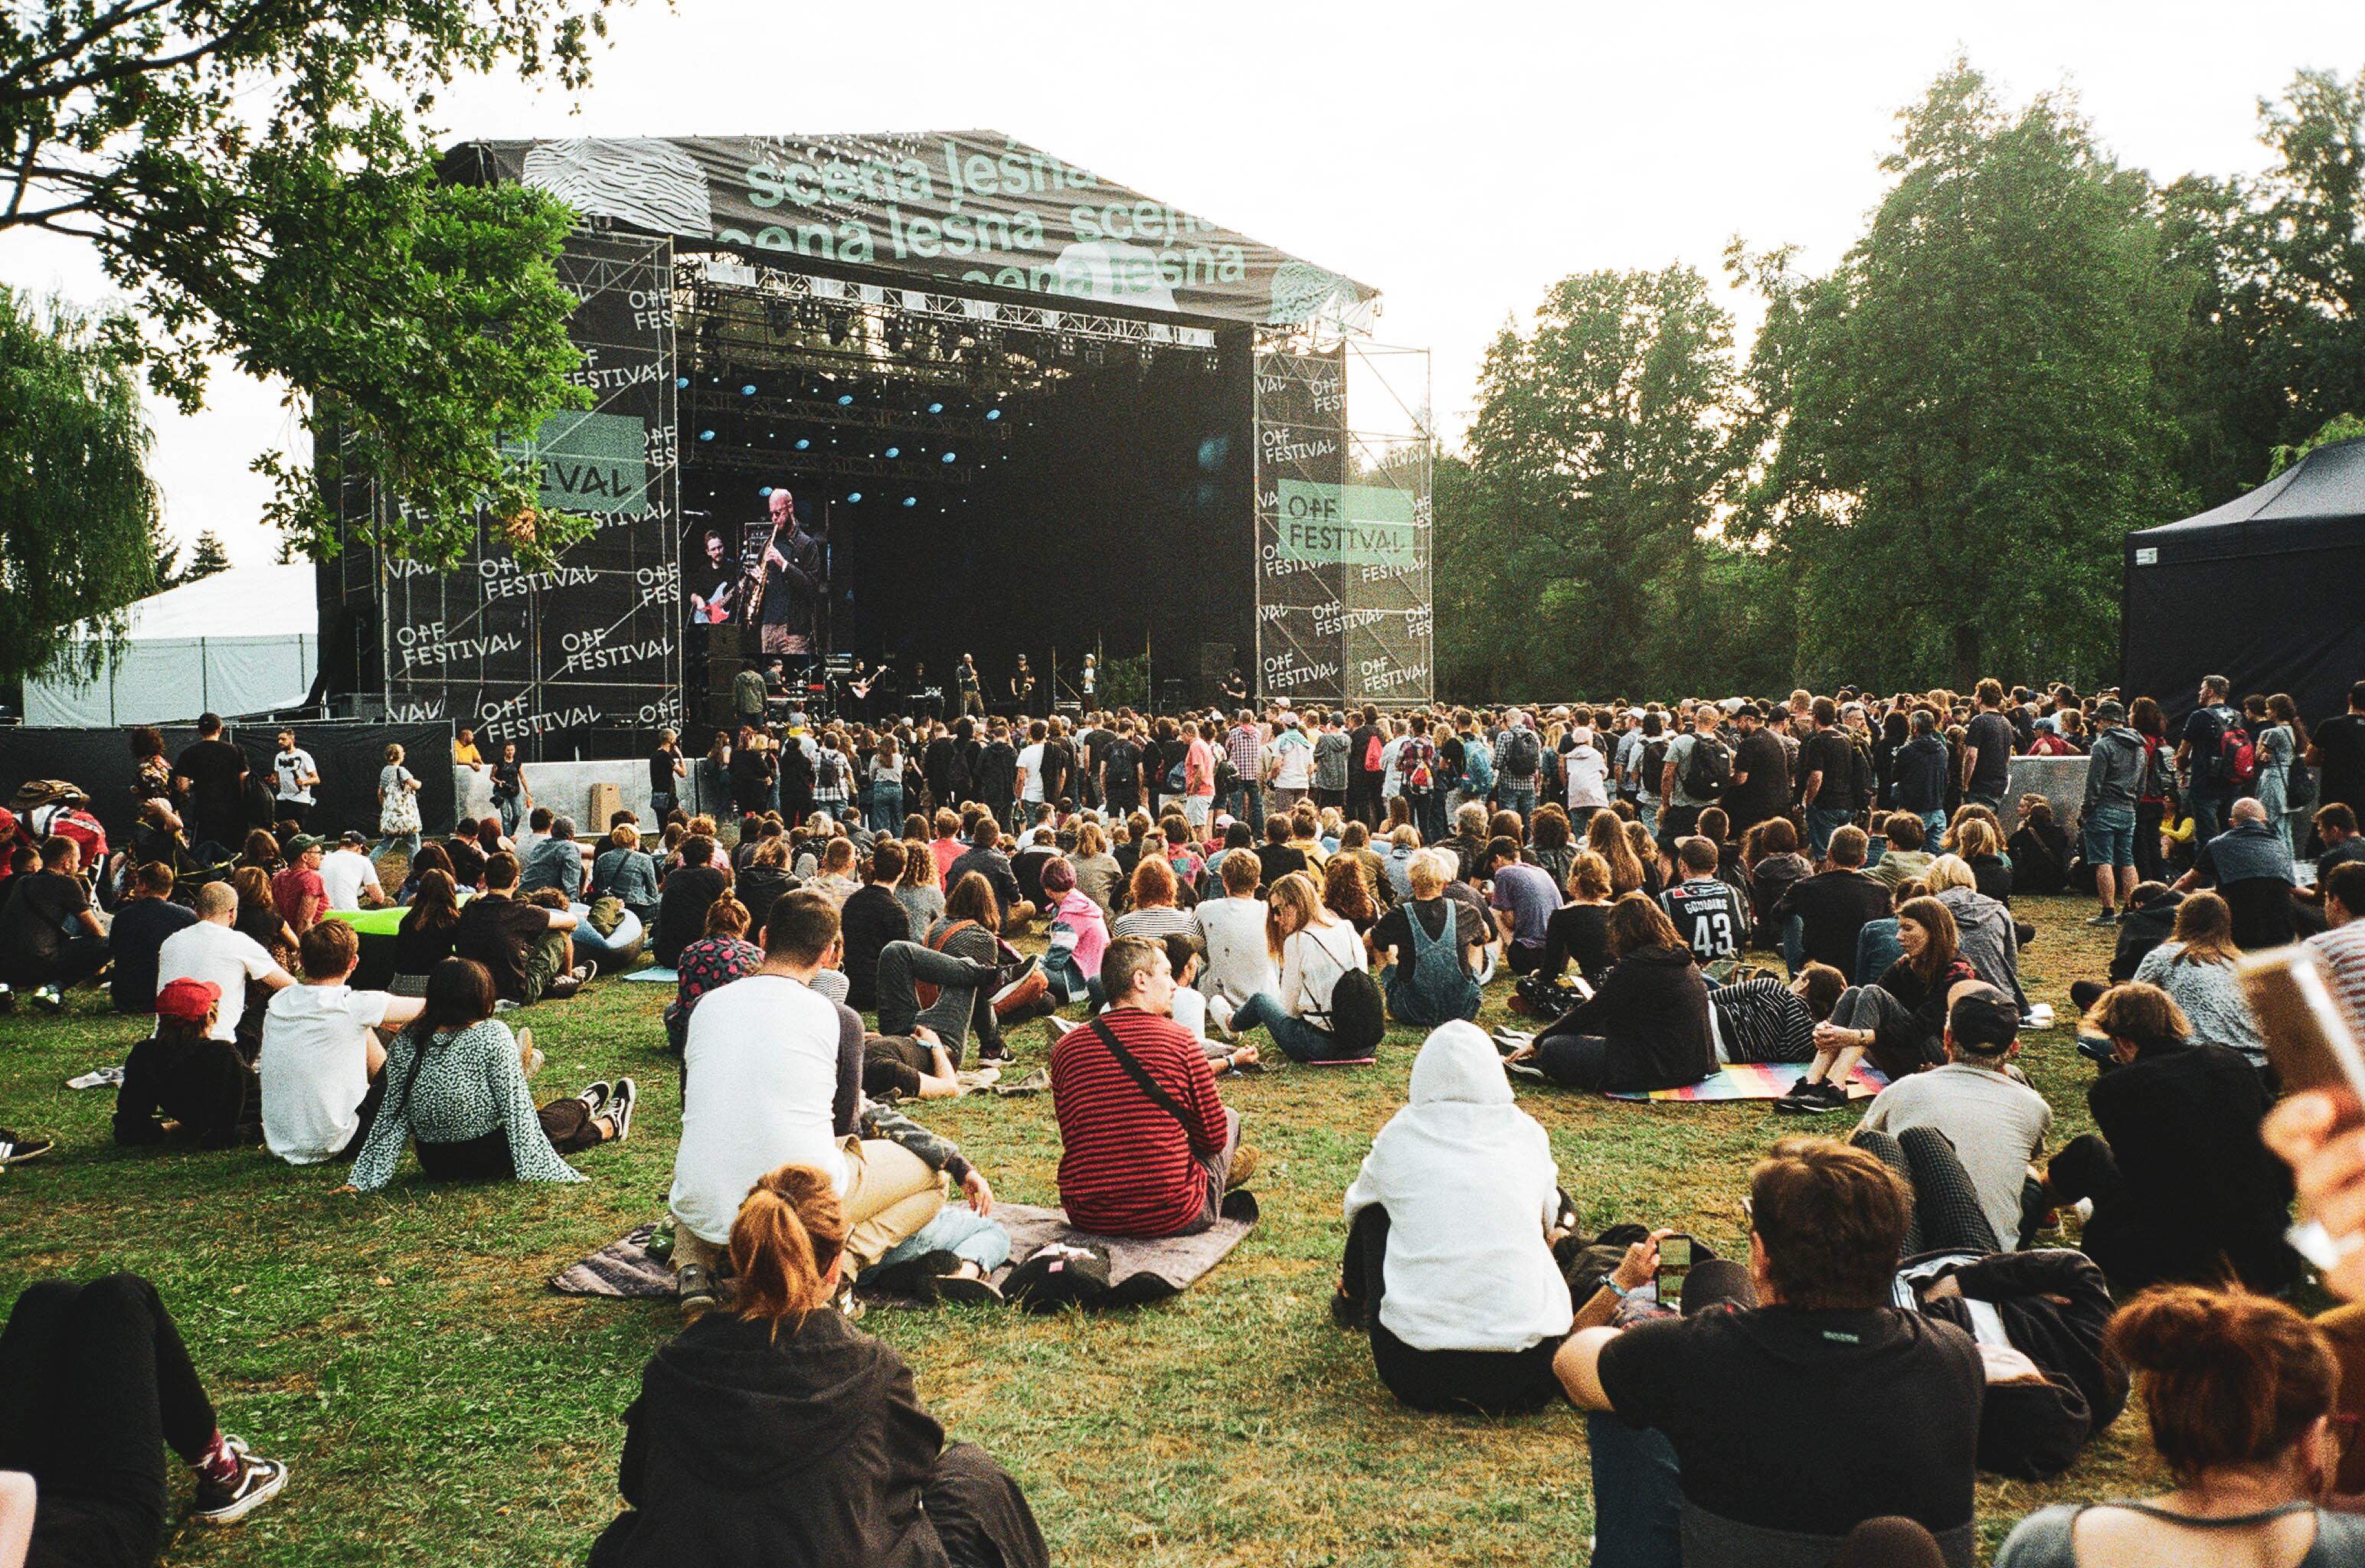 OFF Festival 2019 - Fot. Zofia Paśnik